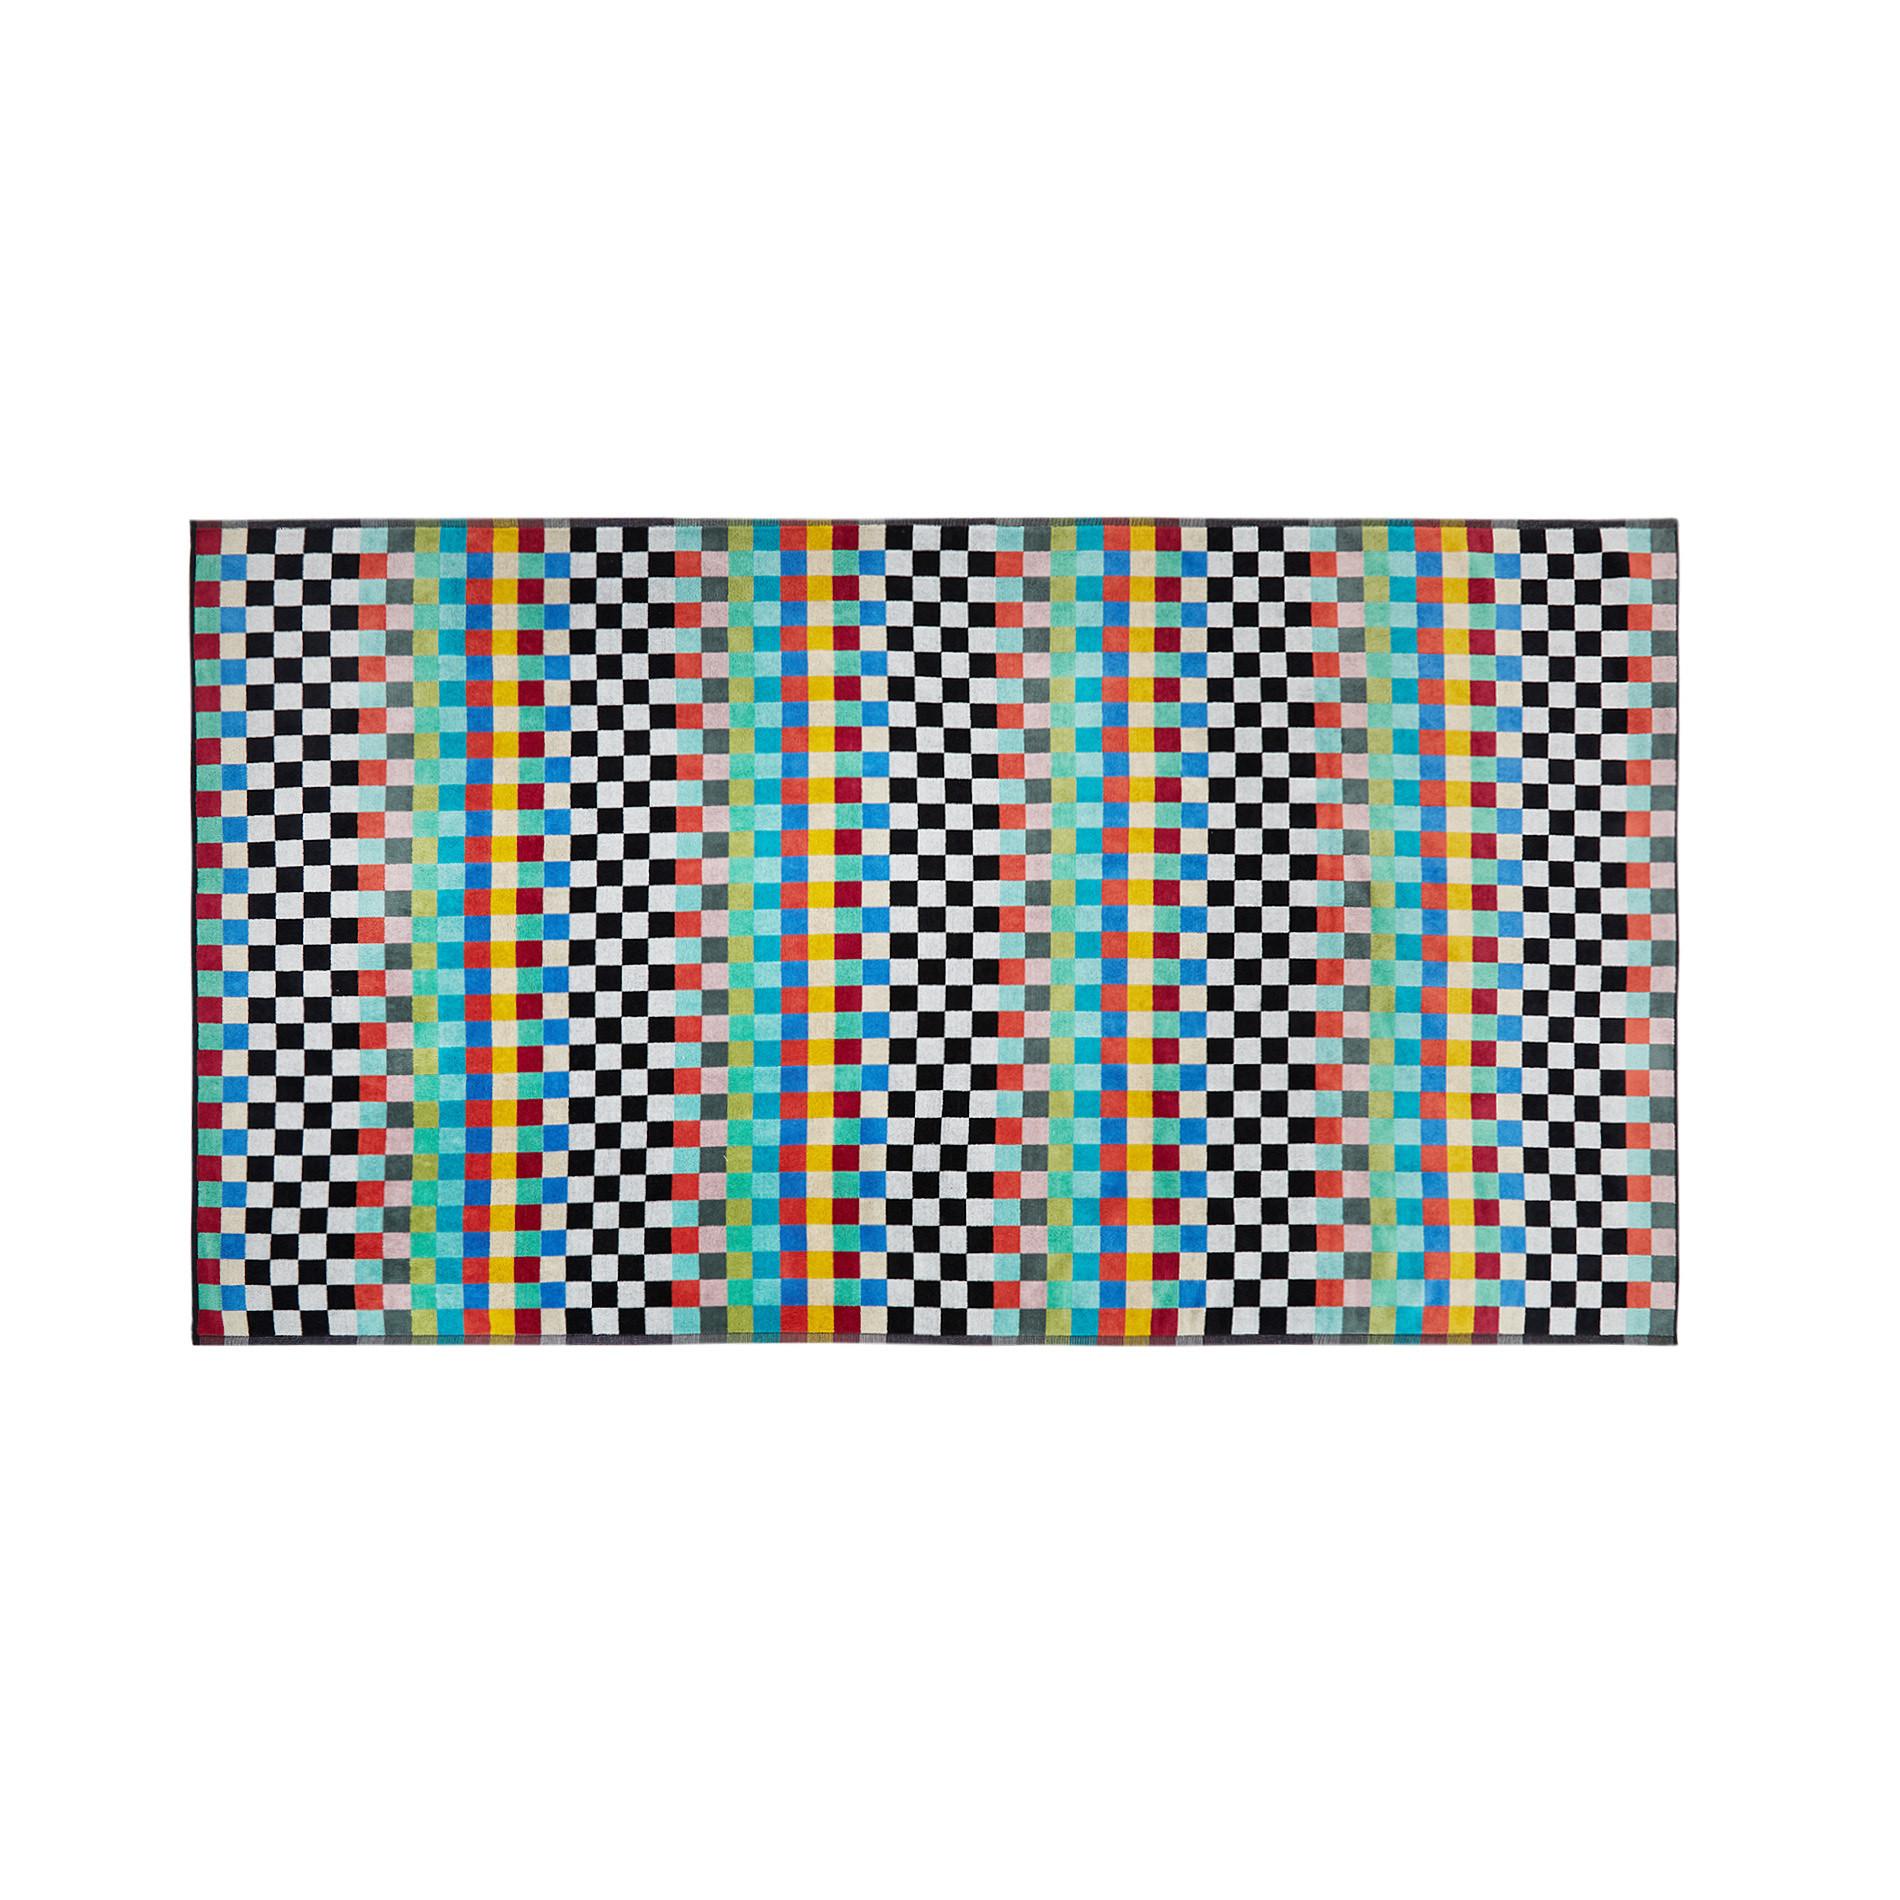 Telo mare cotone velour motivo check, Multicolor, large image number 0